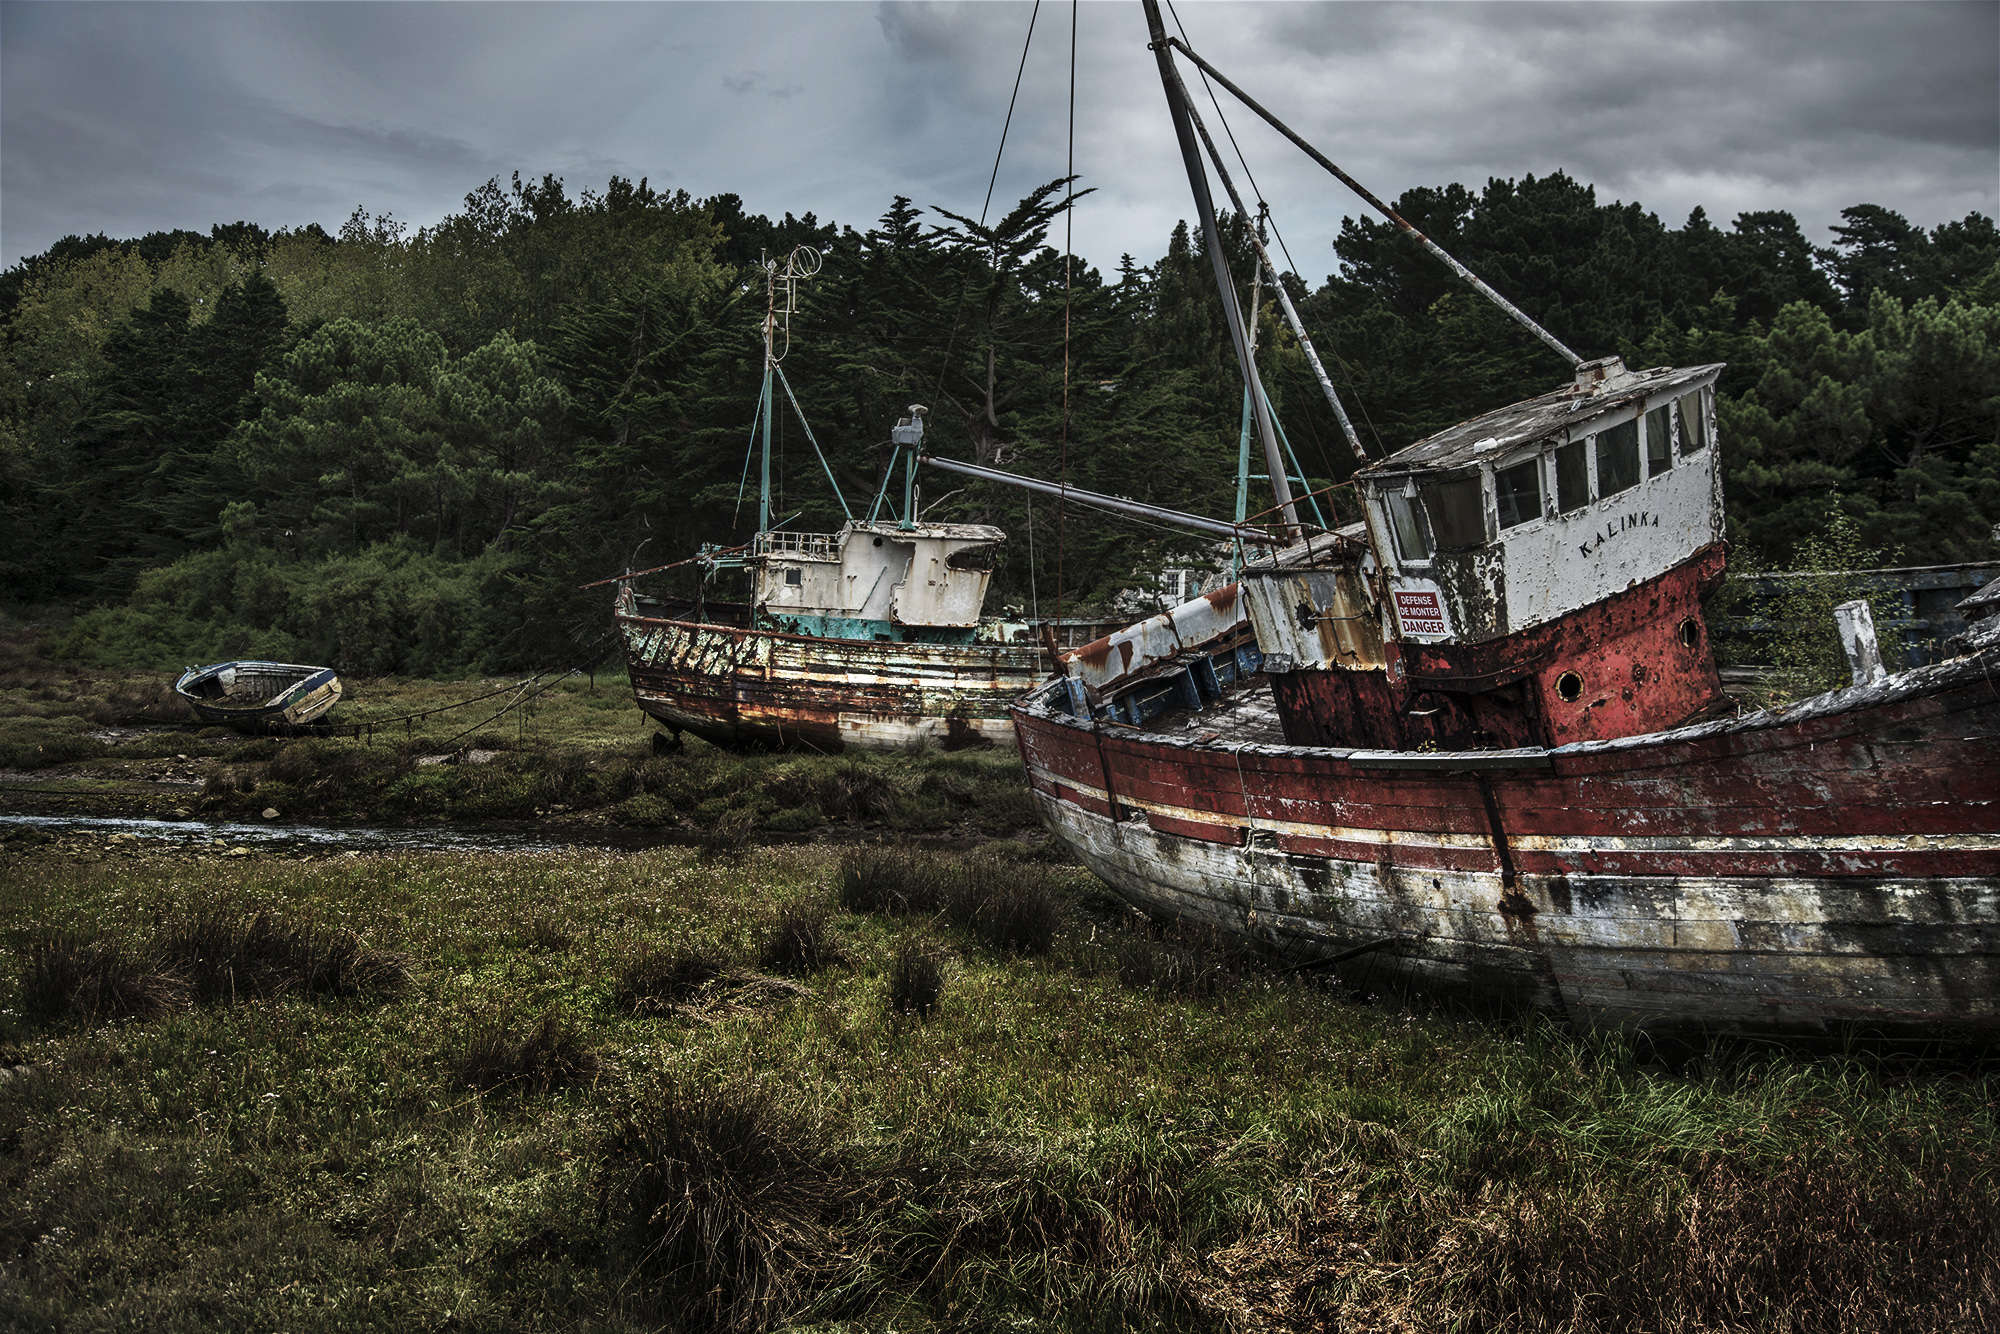 Brittany_Abandoned_Boats_2017-006.jpg